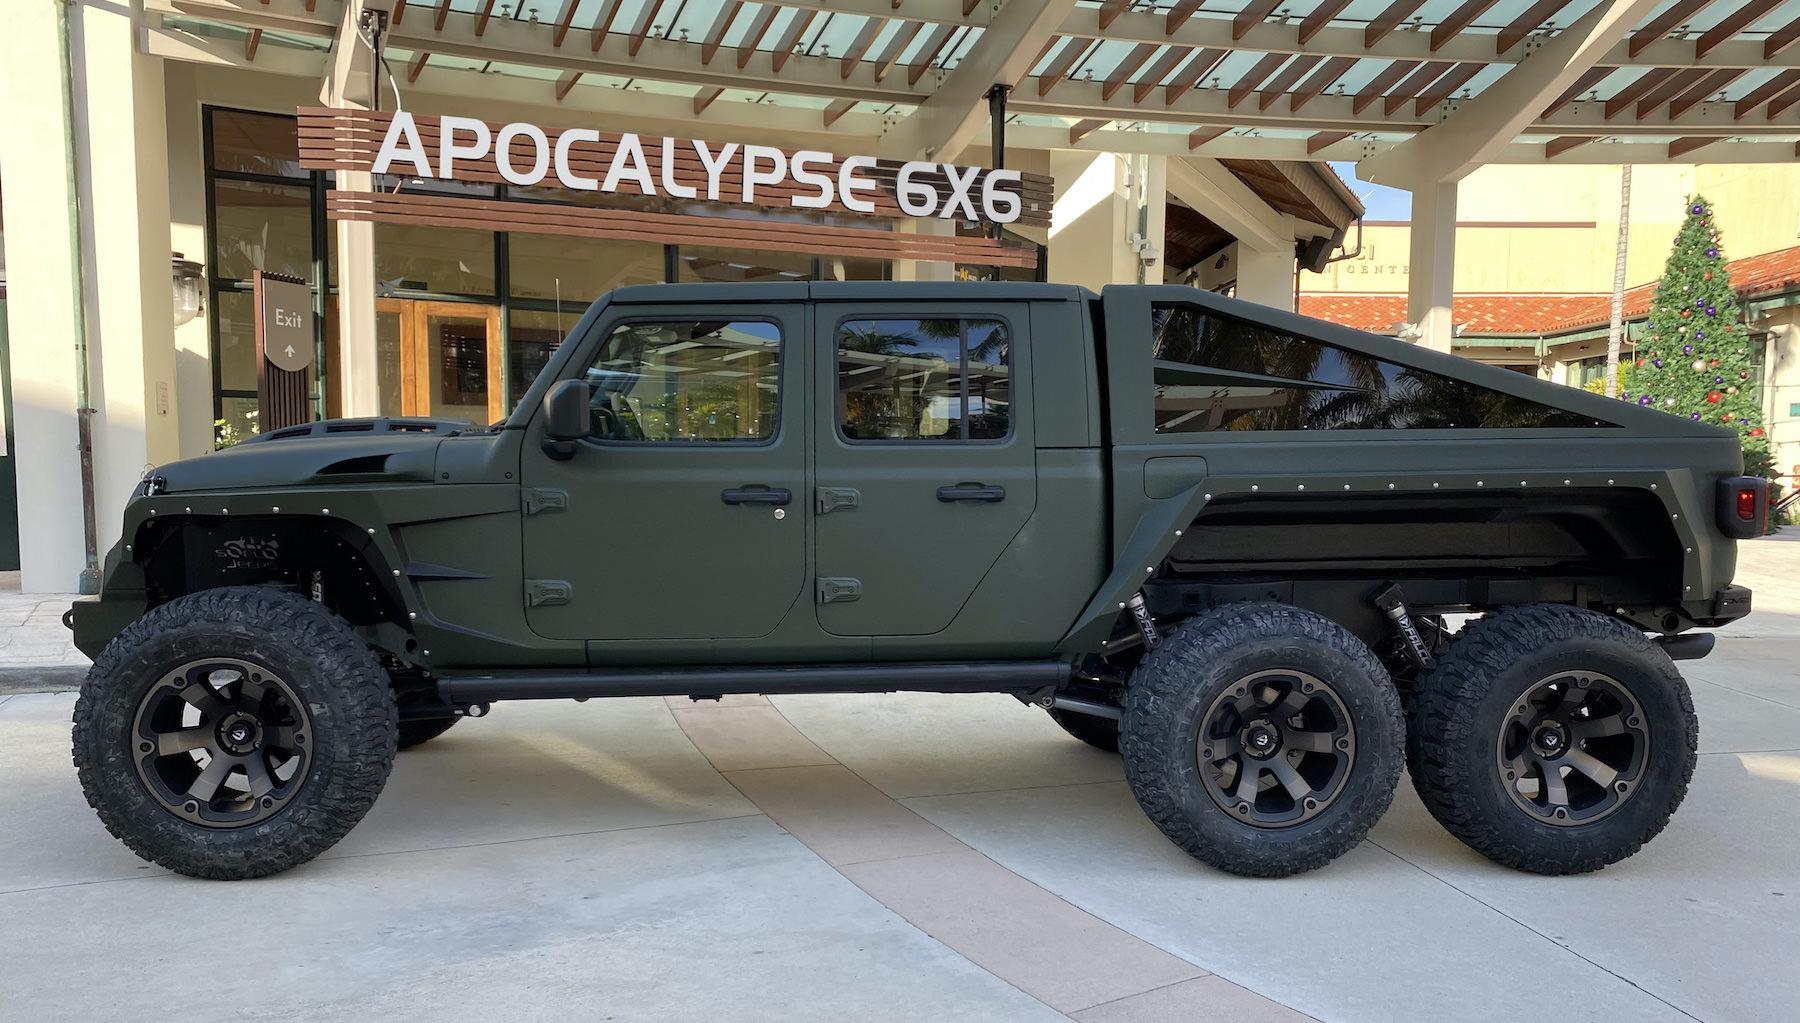 Apocalypse 6x6 Custom Jeep